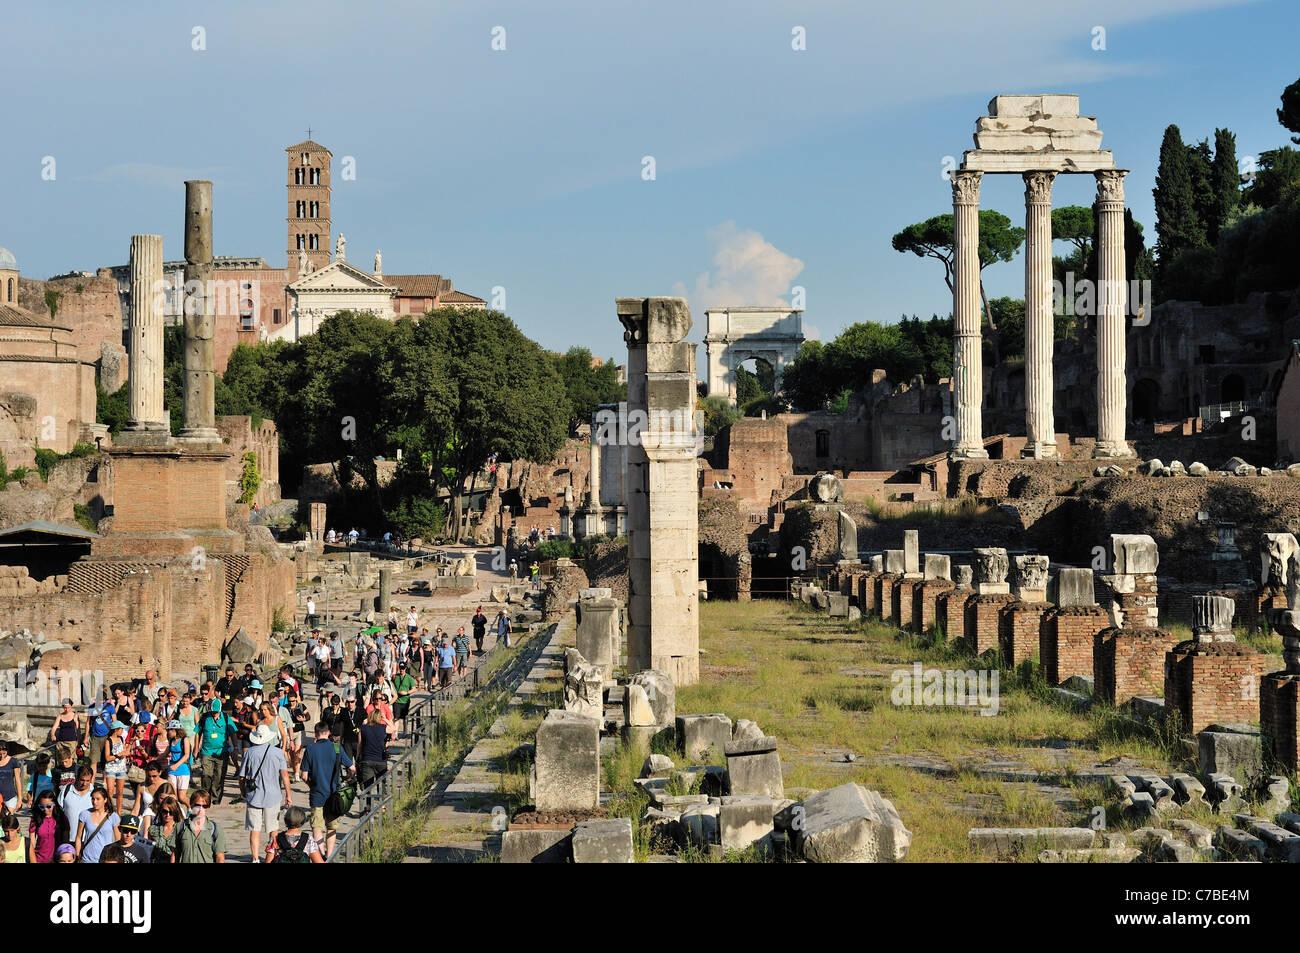 Rome. Italy. Tourists visiting the Roman Forum (Foro Romano). - Stock Image